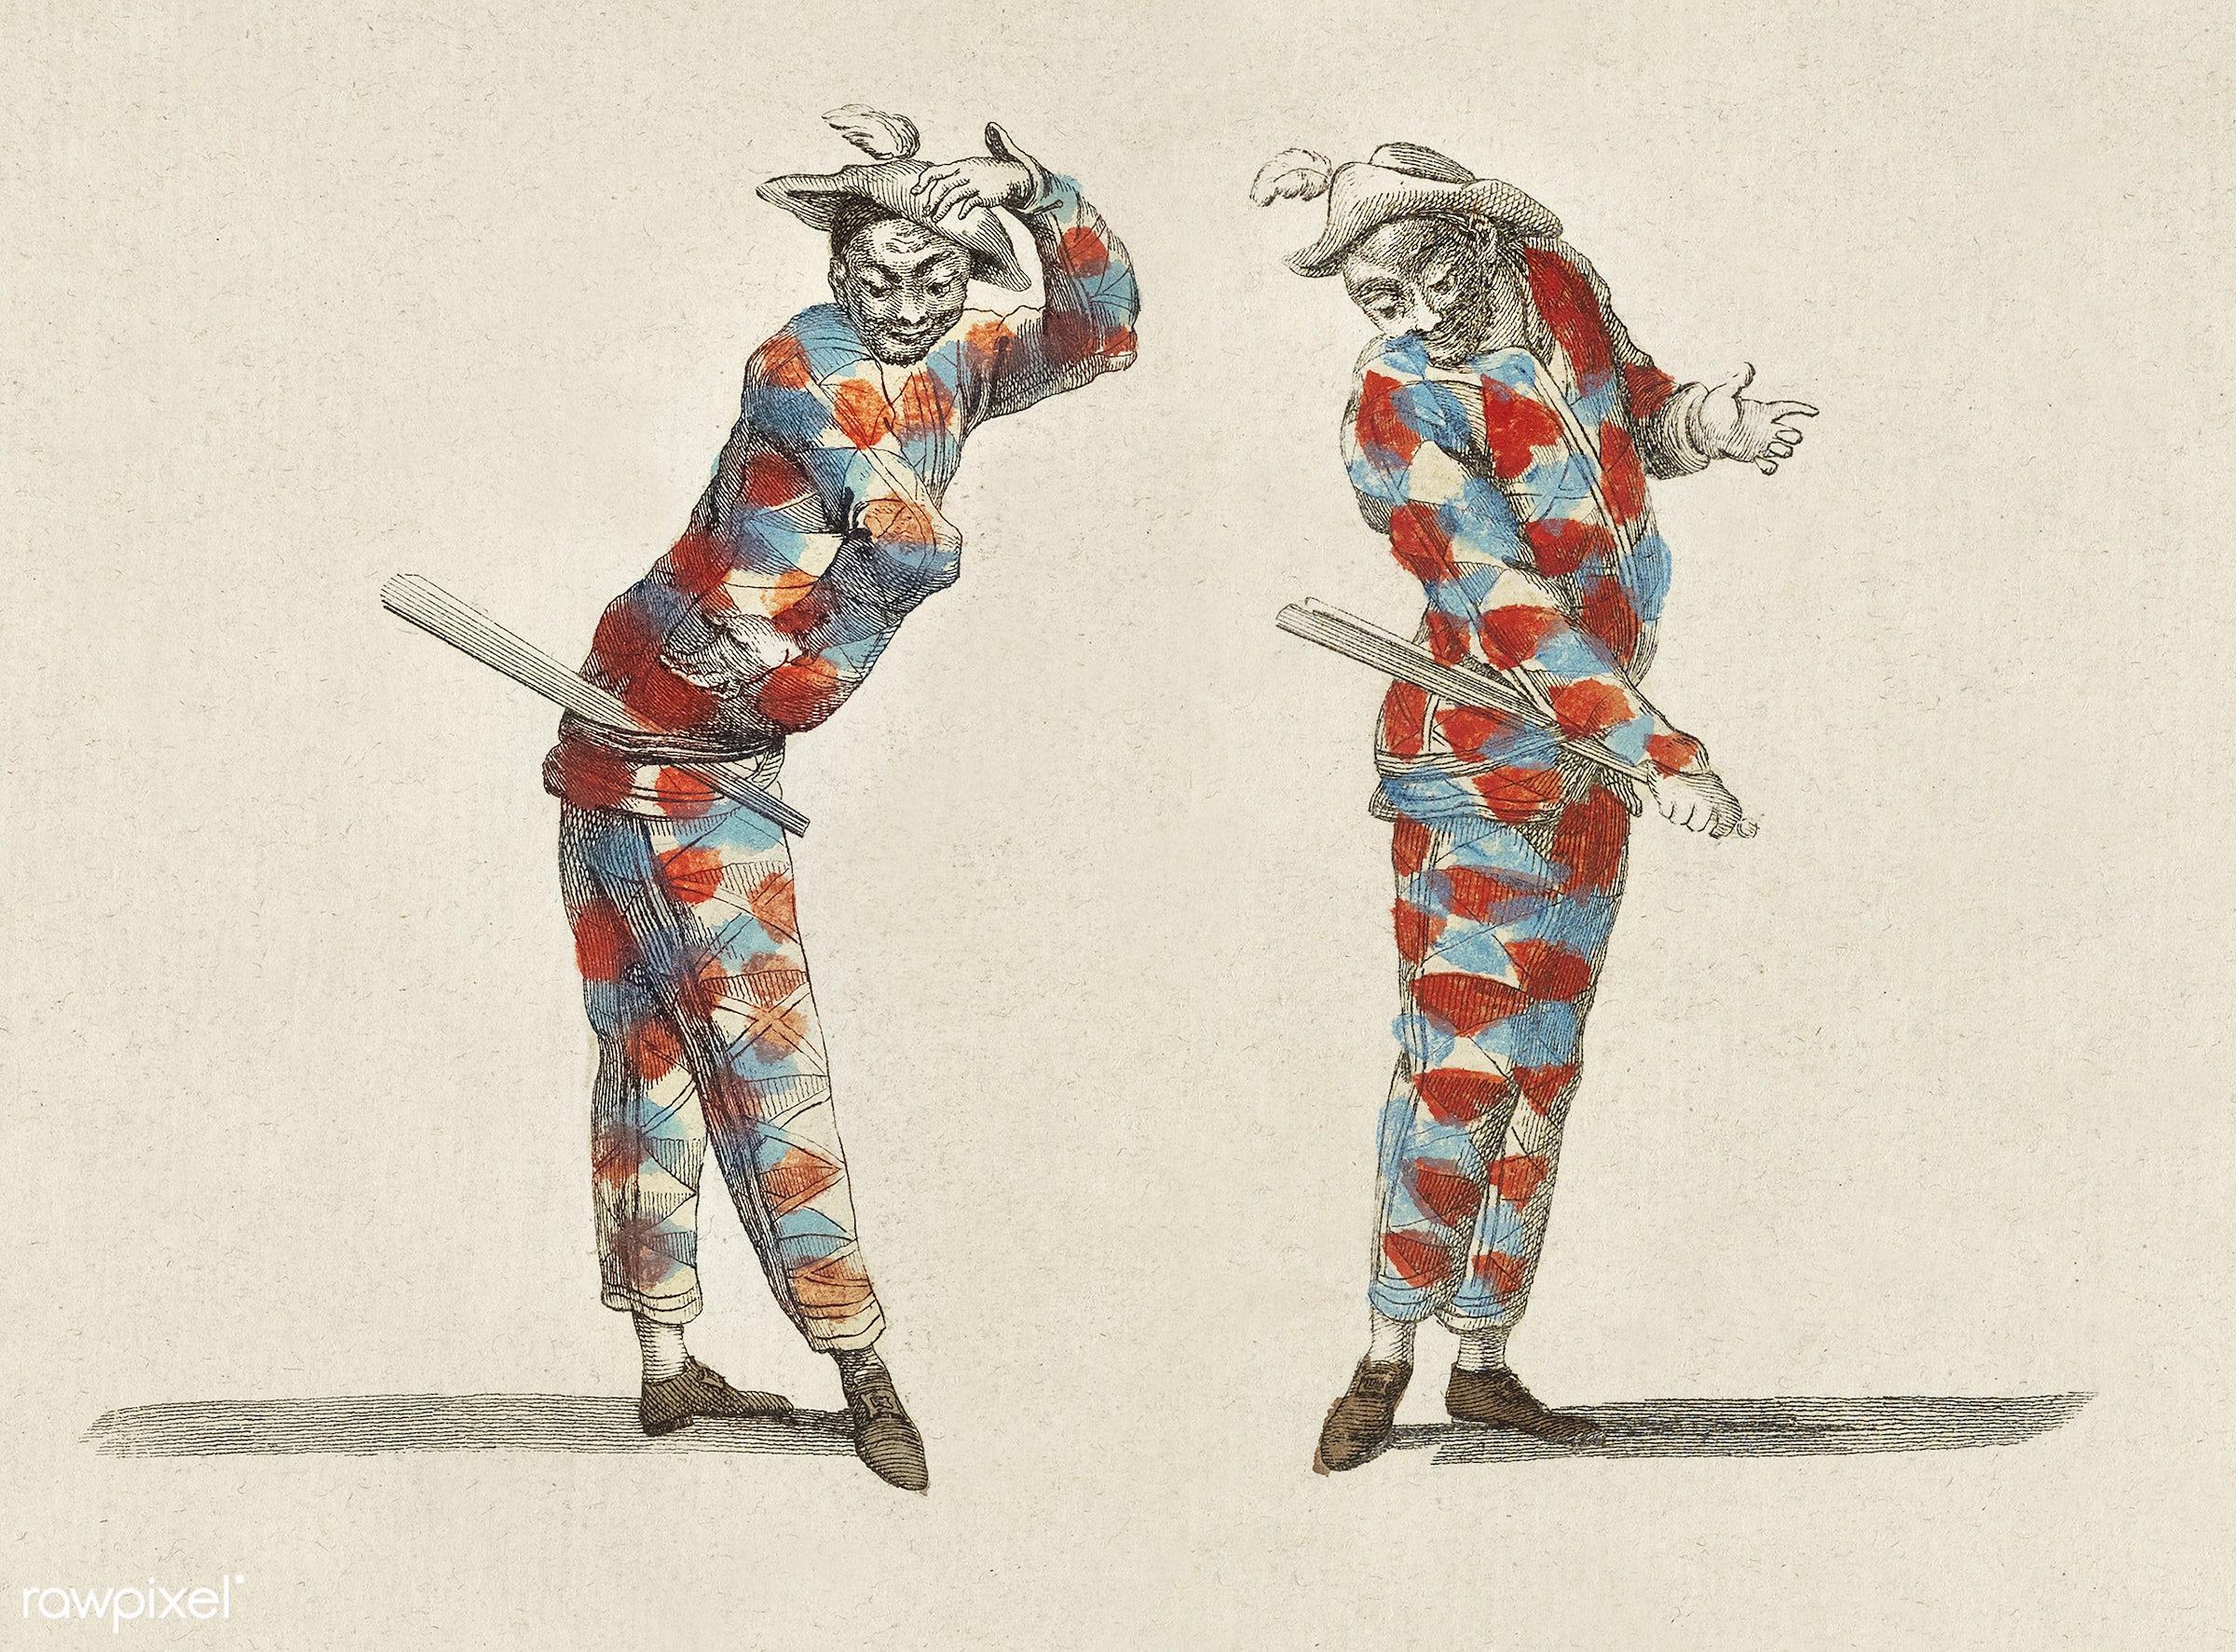 Vintage illustration of Harlequin published in 18th century. - actor, african, antique, artist, artwork, cc0, clown,...